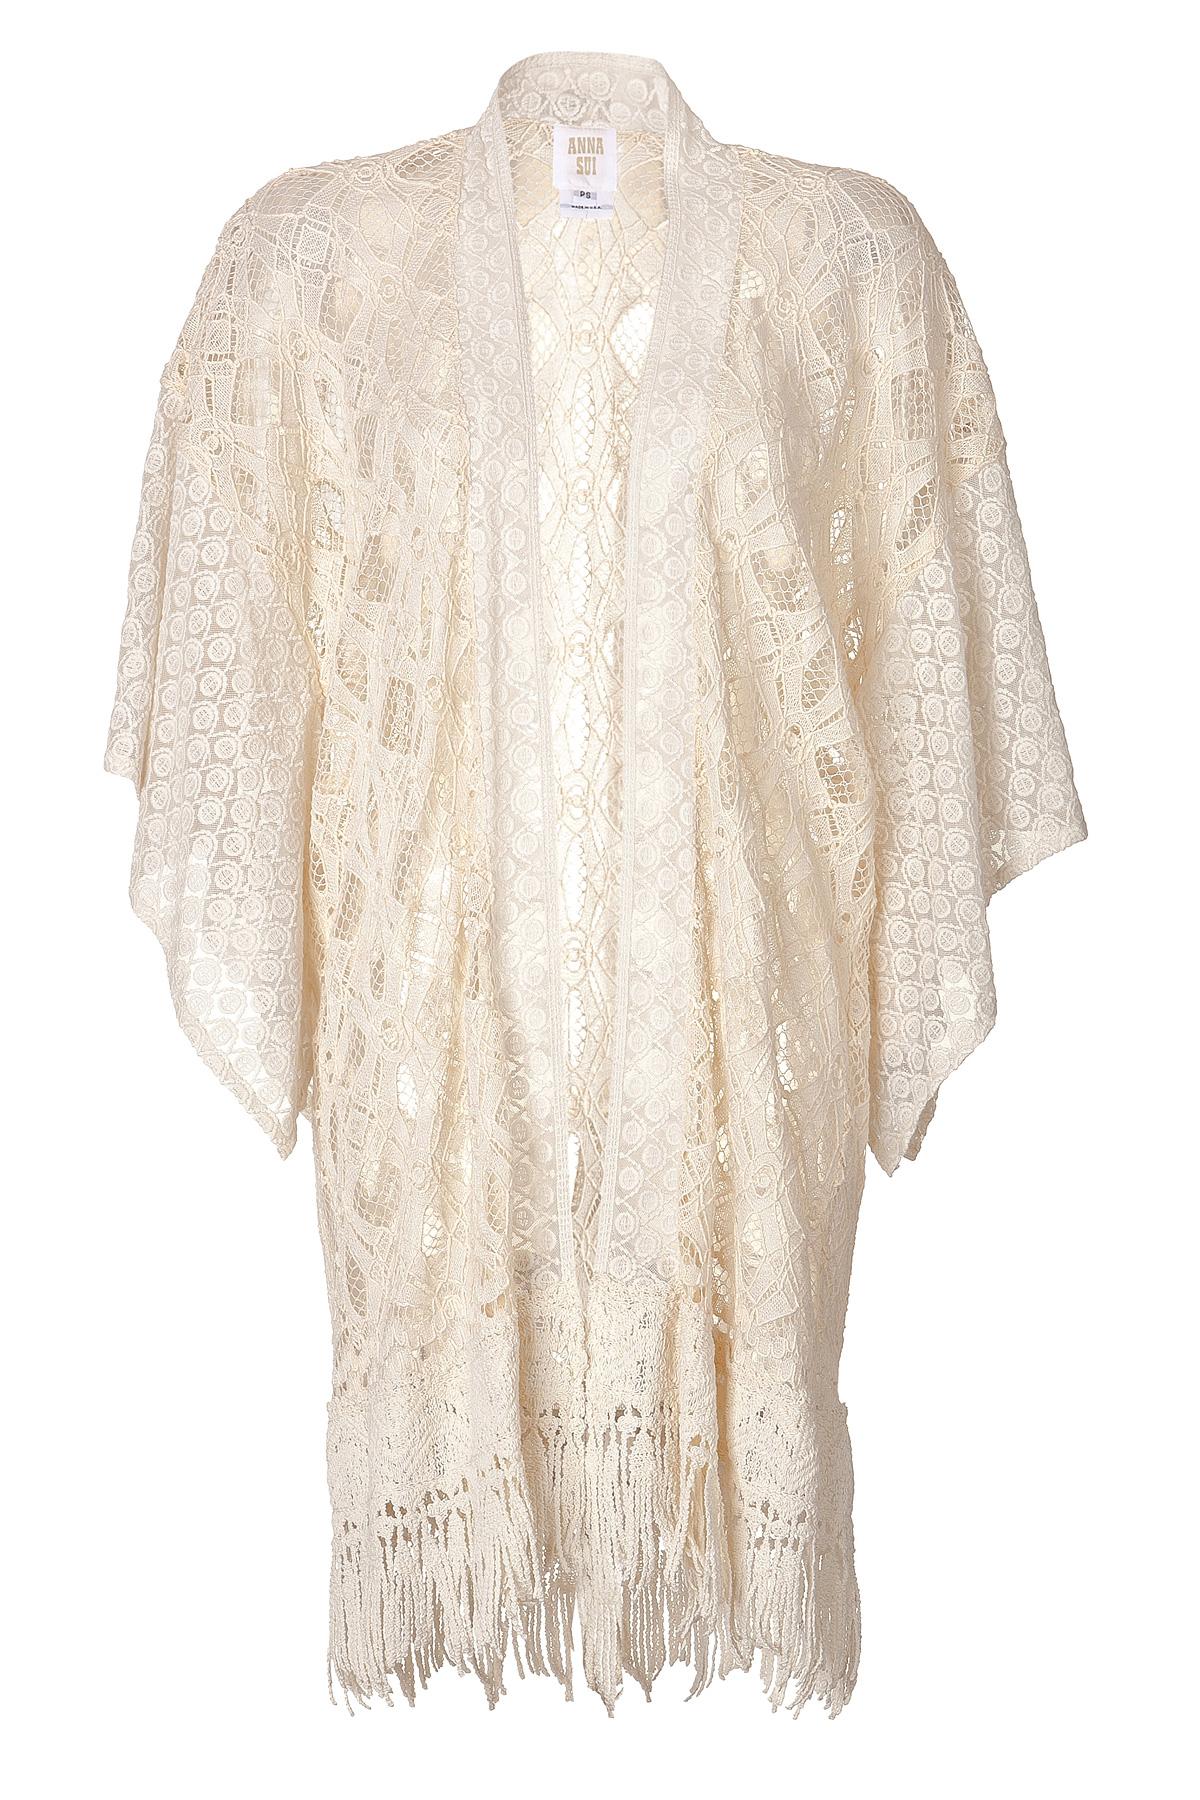 Lace Kimono Knitting Pattern : Anna Sui Lace Crochet Knit Kimono in White Lyst